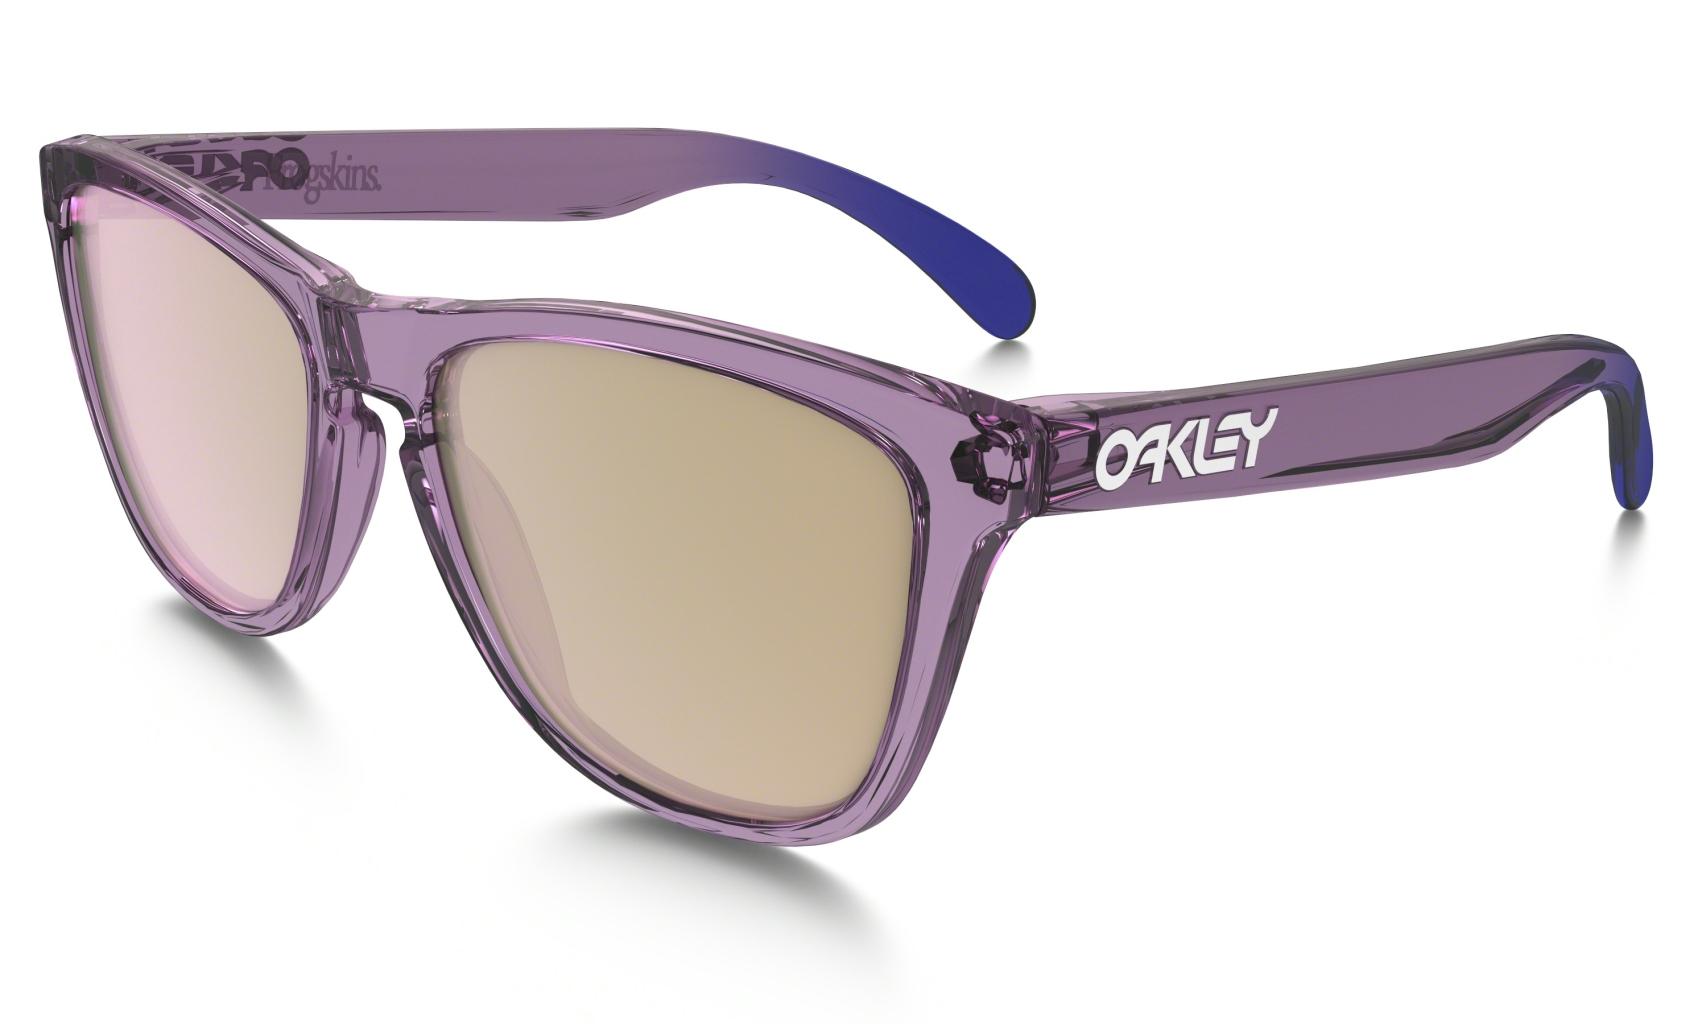 Oakley Frogskin Alpine Glow w/Pink Iri-30